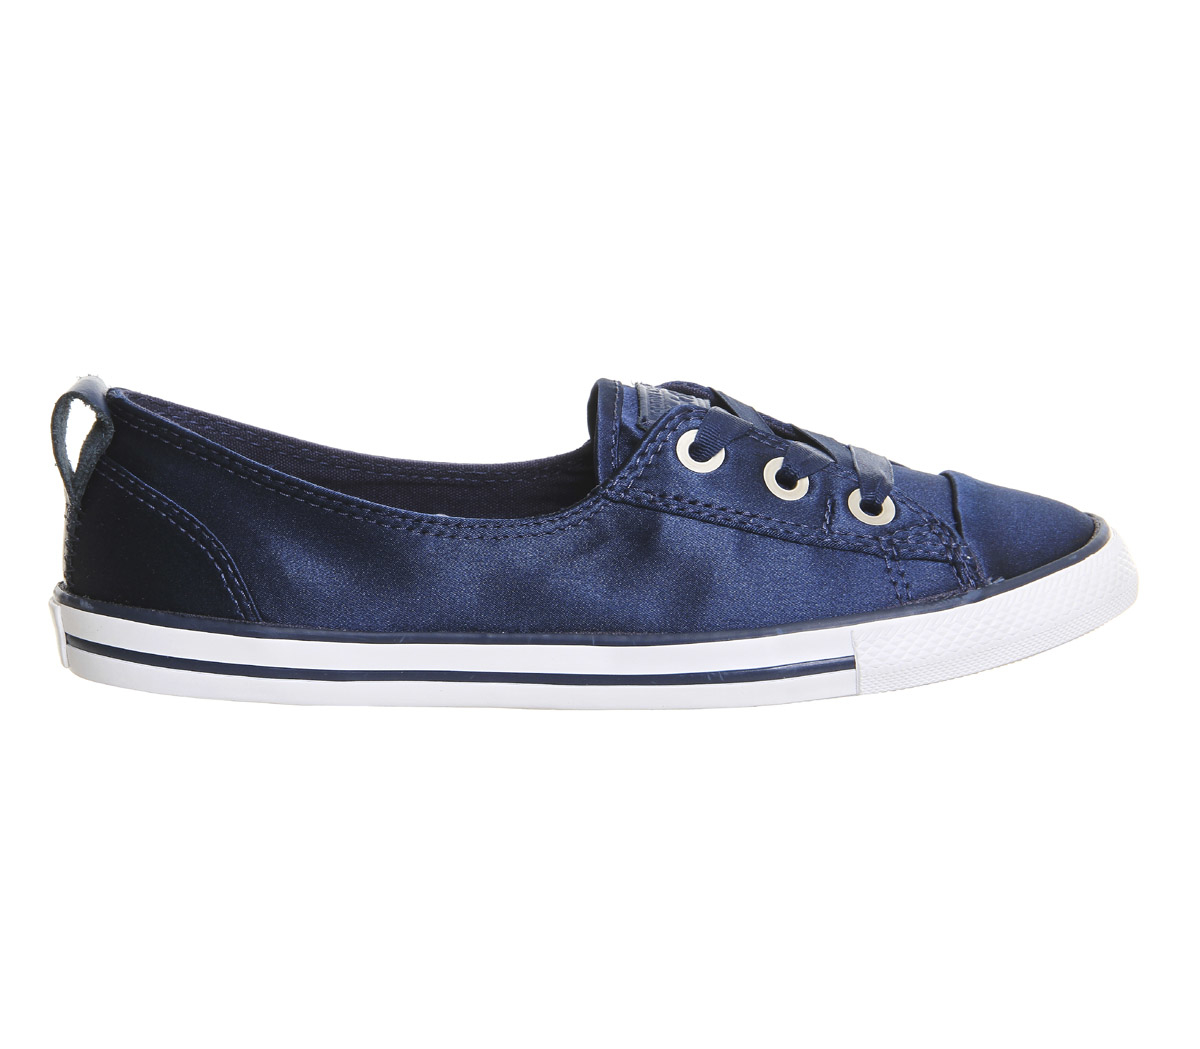 Converse Ctas Ballet Lace in Navy (Blue